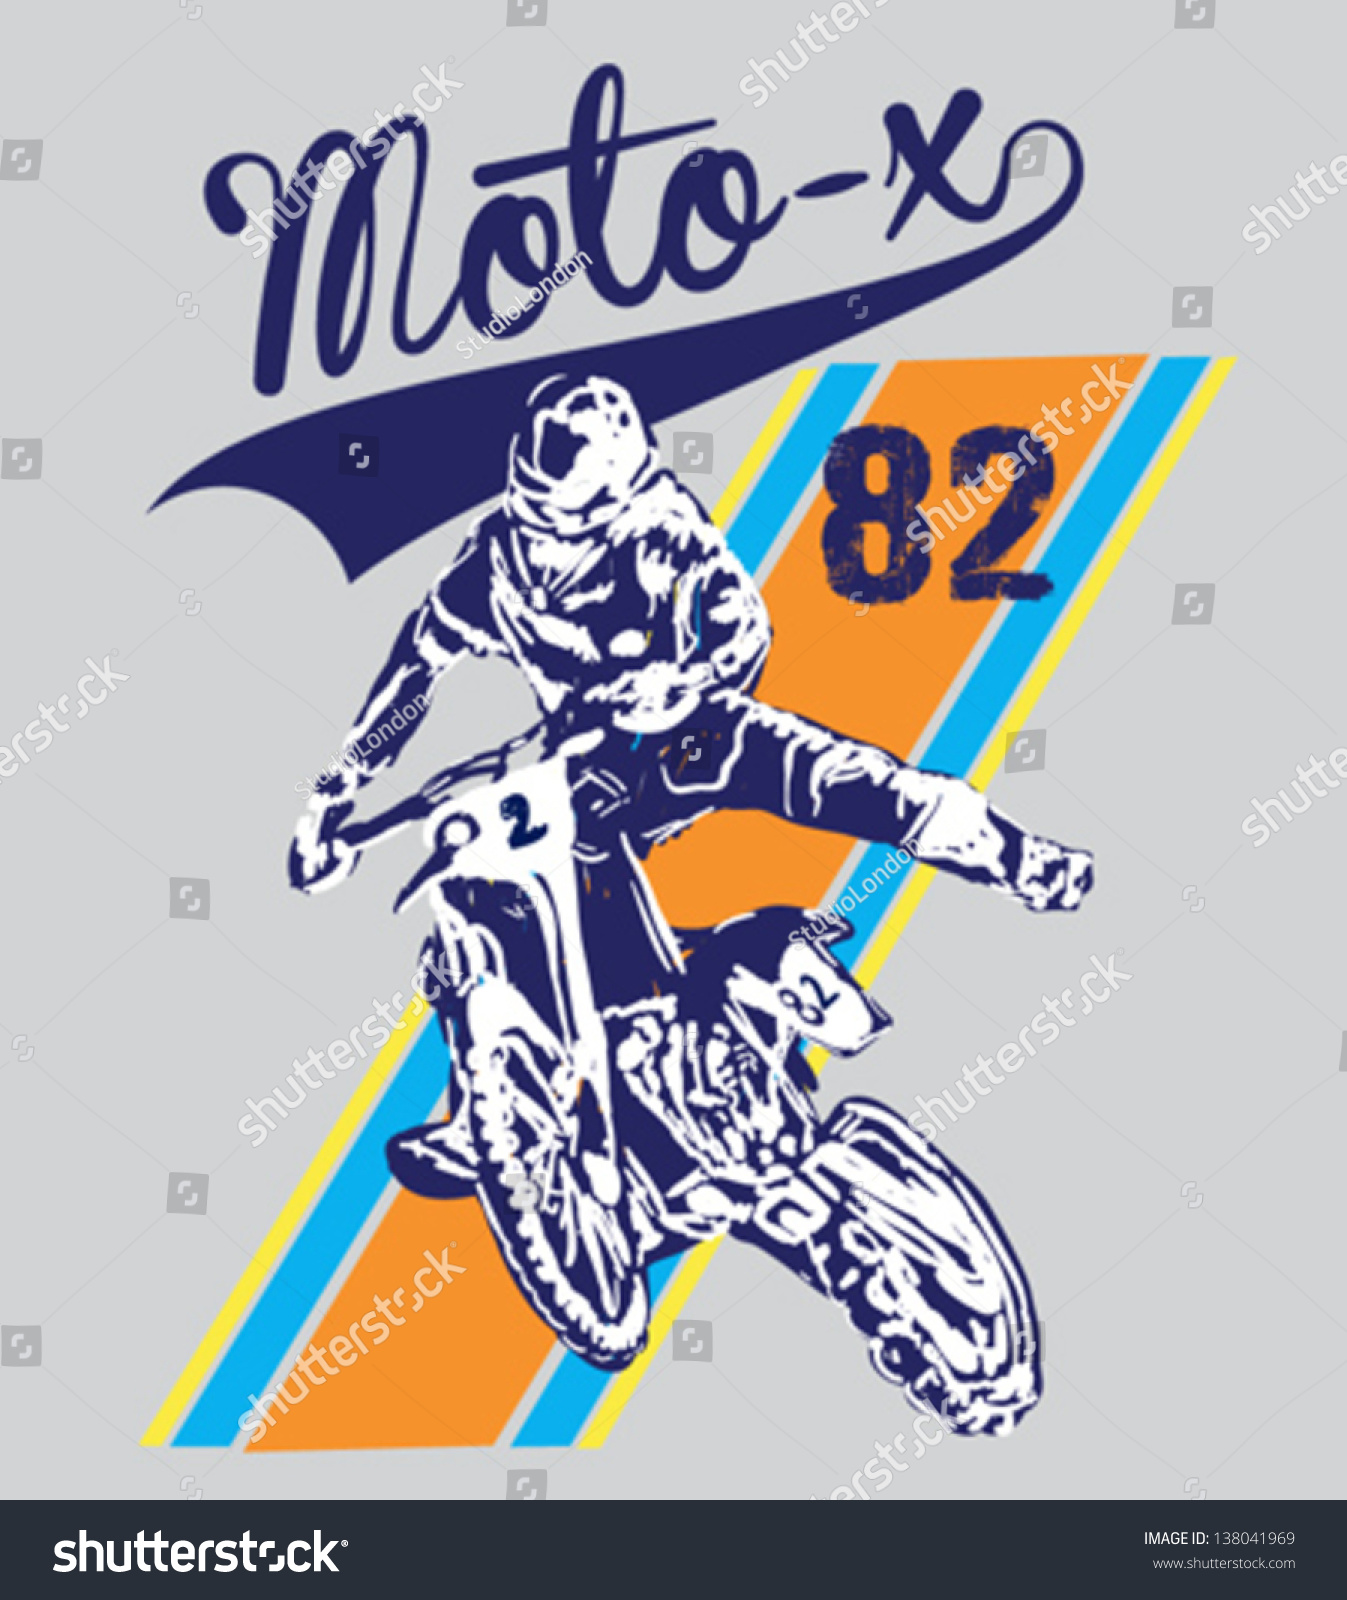 Design t shirt motocross - Motocross T Shirt Graphics Textile Graphic